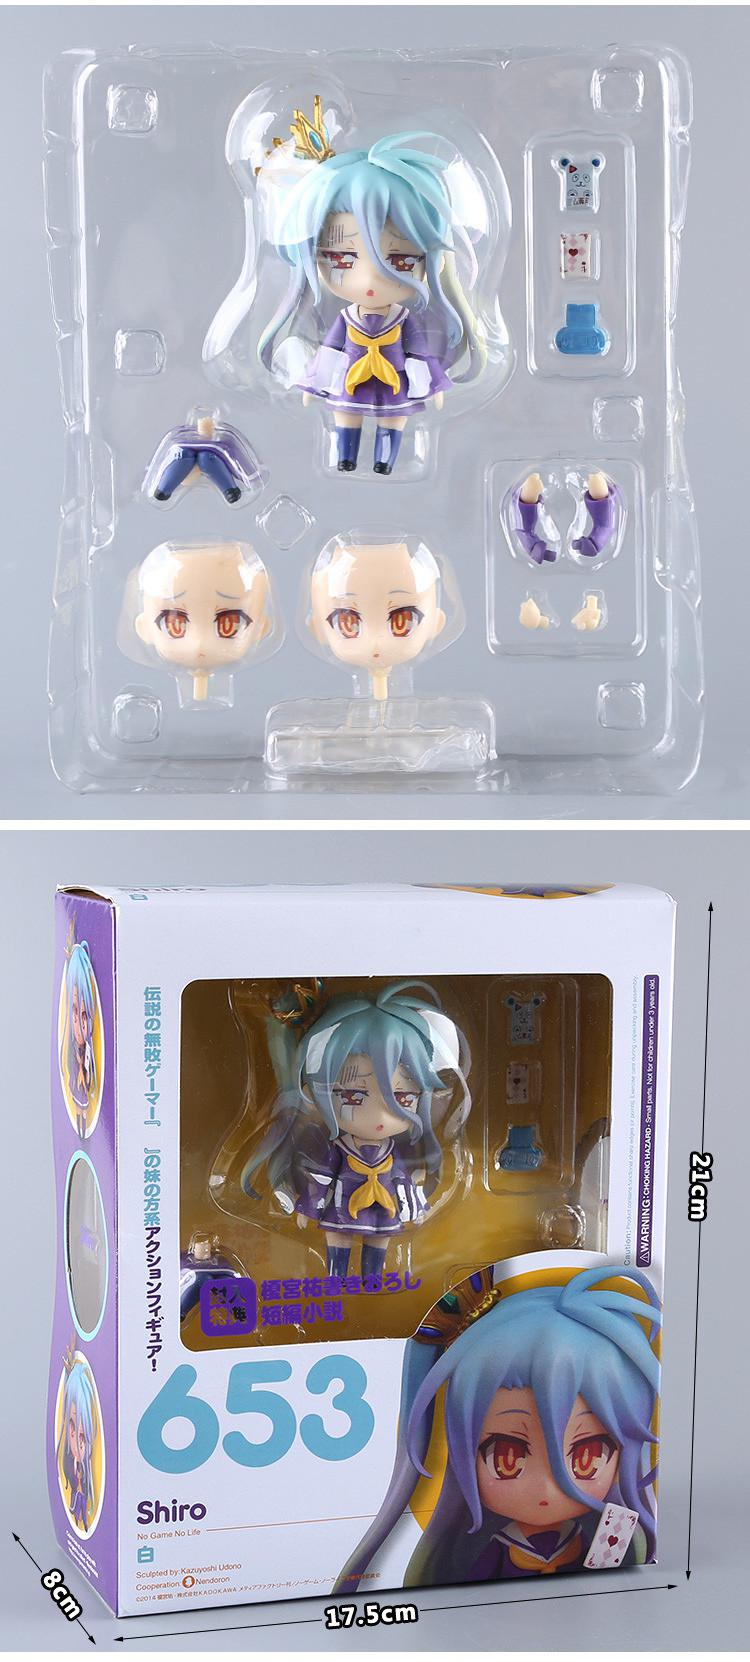 NO GAME NO LIFE Nendoroid Shiro 653# Sora 652# PVC Action